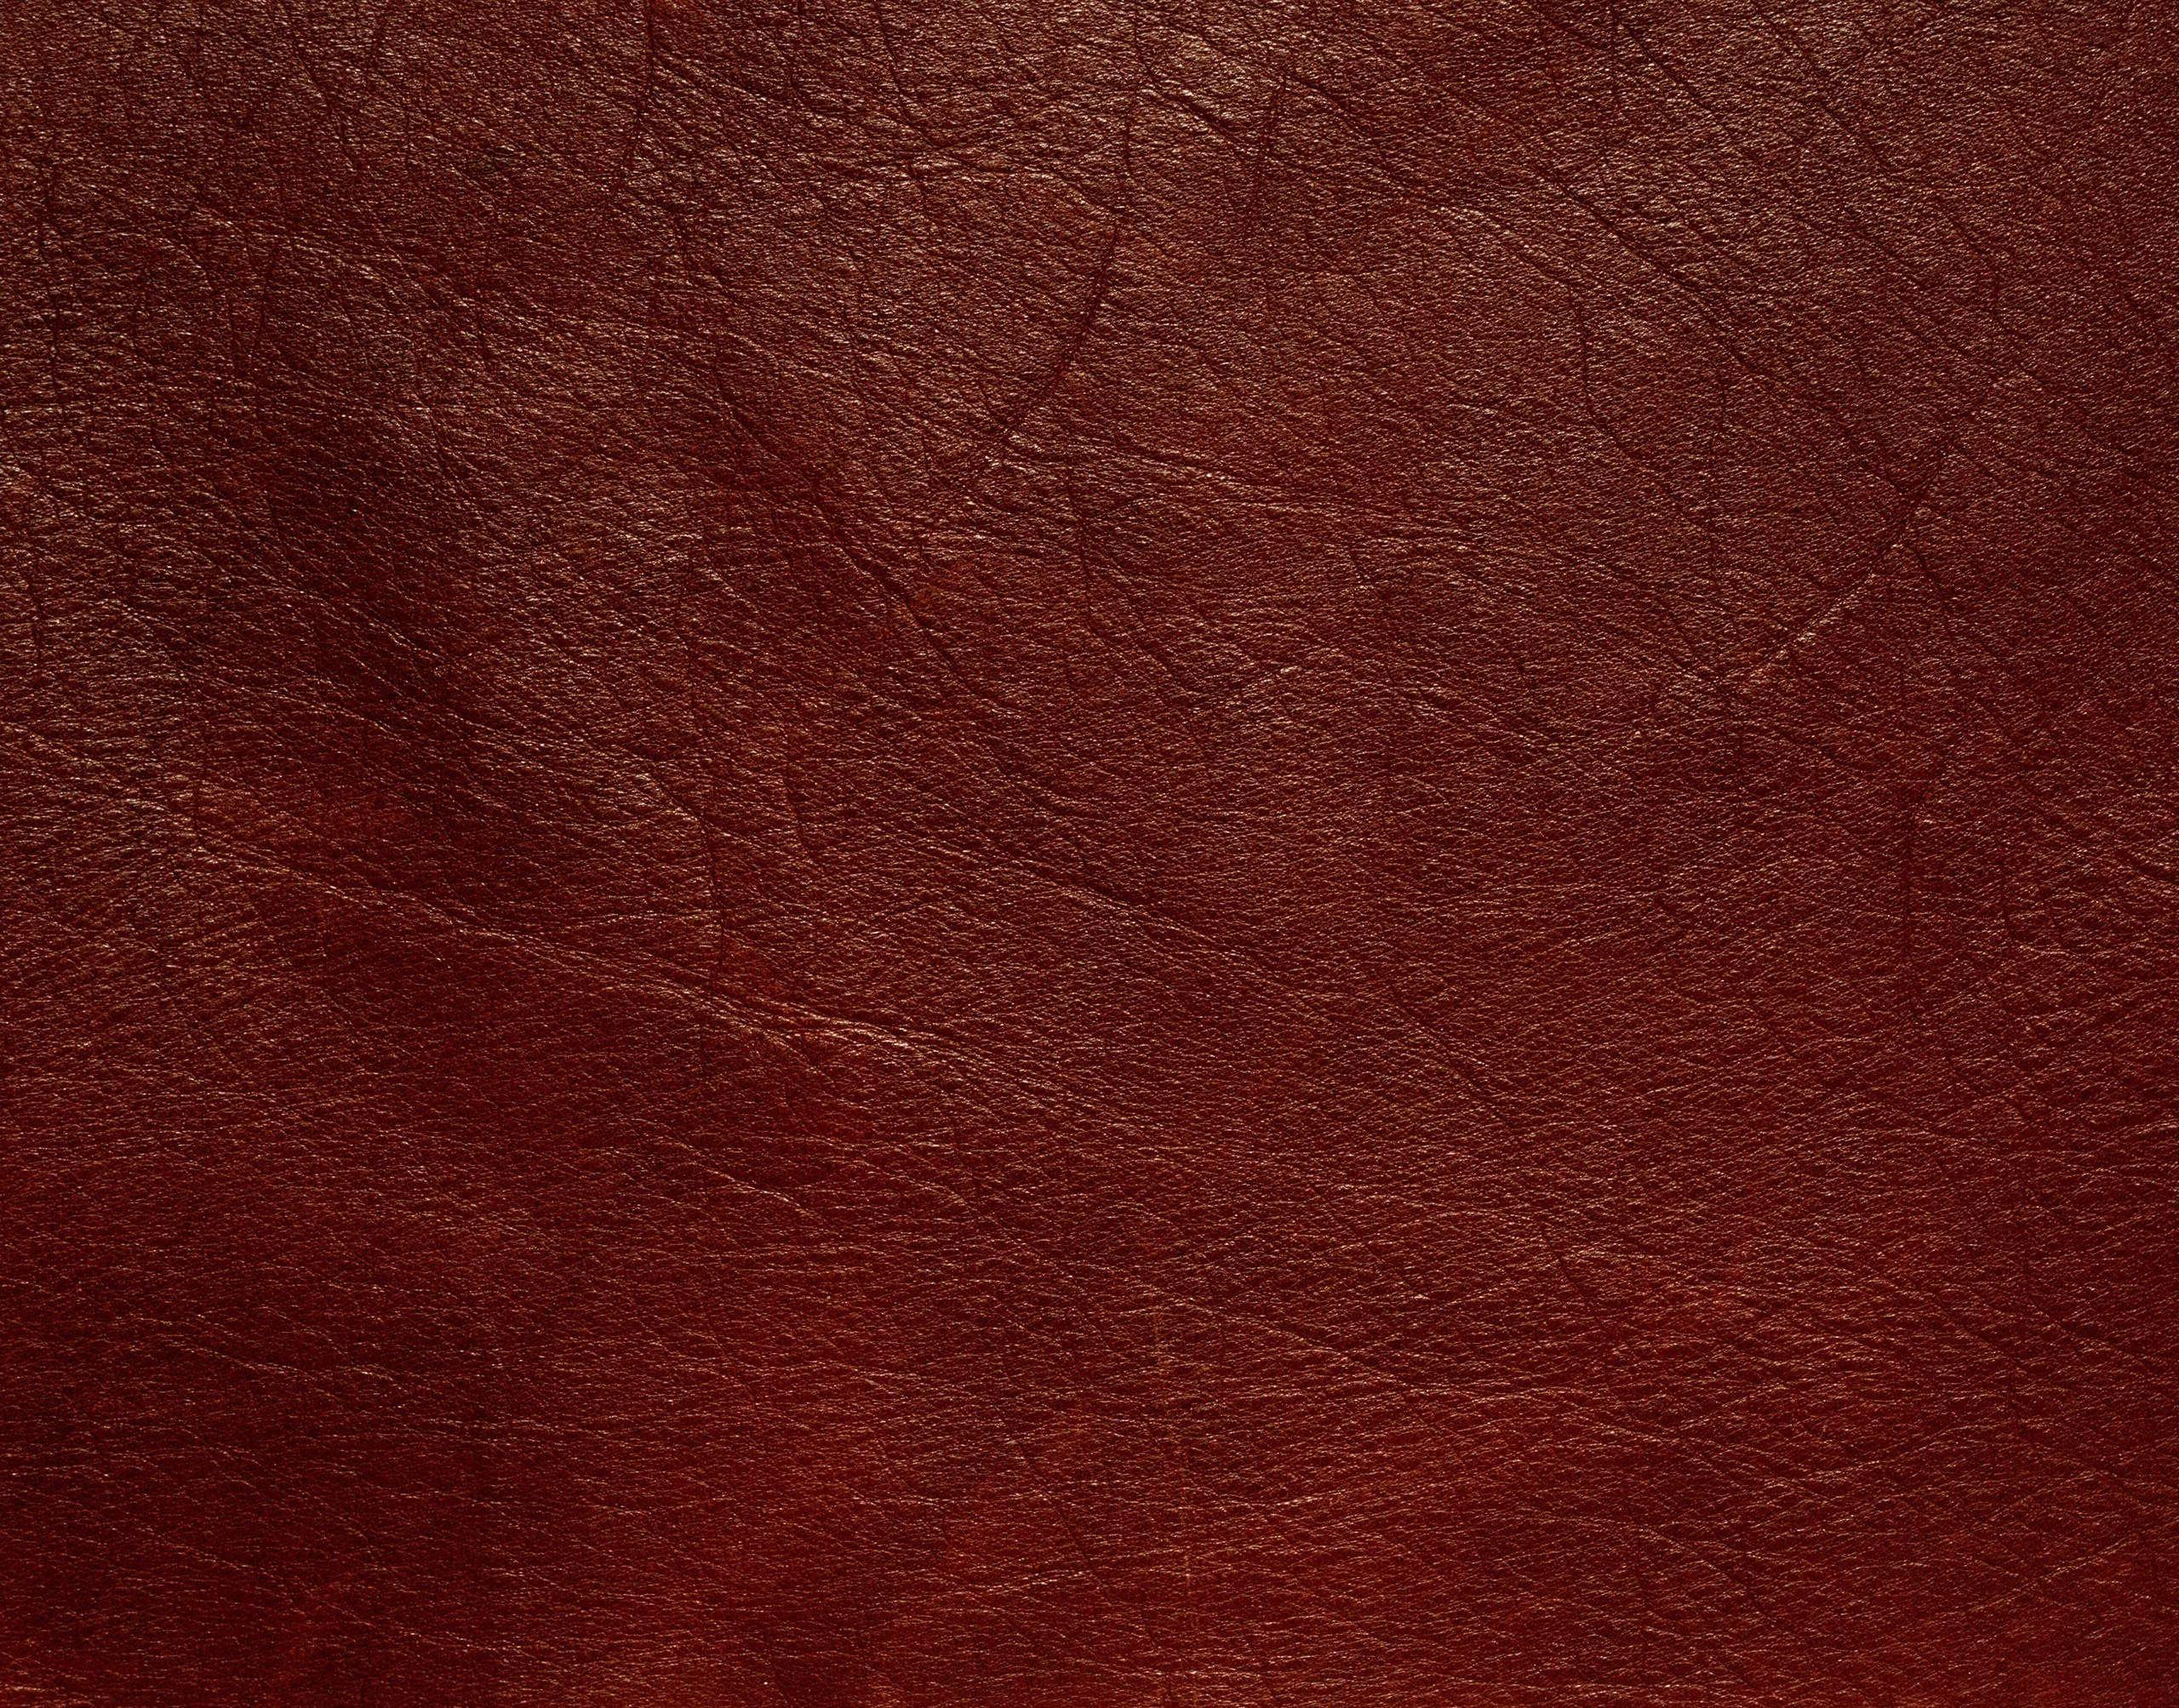 wallpaper red brown pattern texture skin veins background material floor maroon hardwood textile dressing laminate flooring 2560x2007 4kwallpaper 629439 hd wallpapers wallhere red brown pattern texture skin